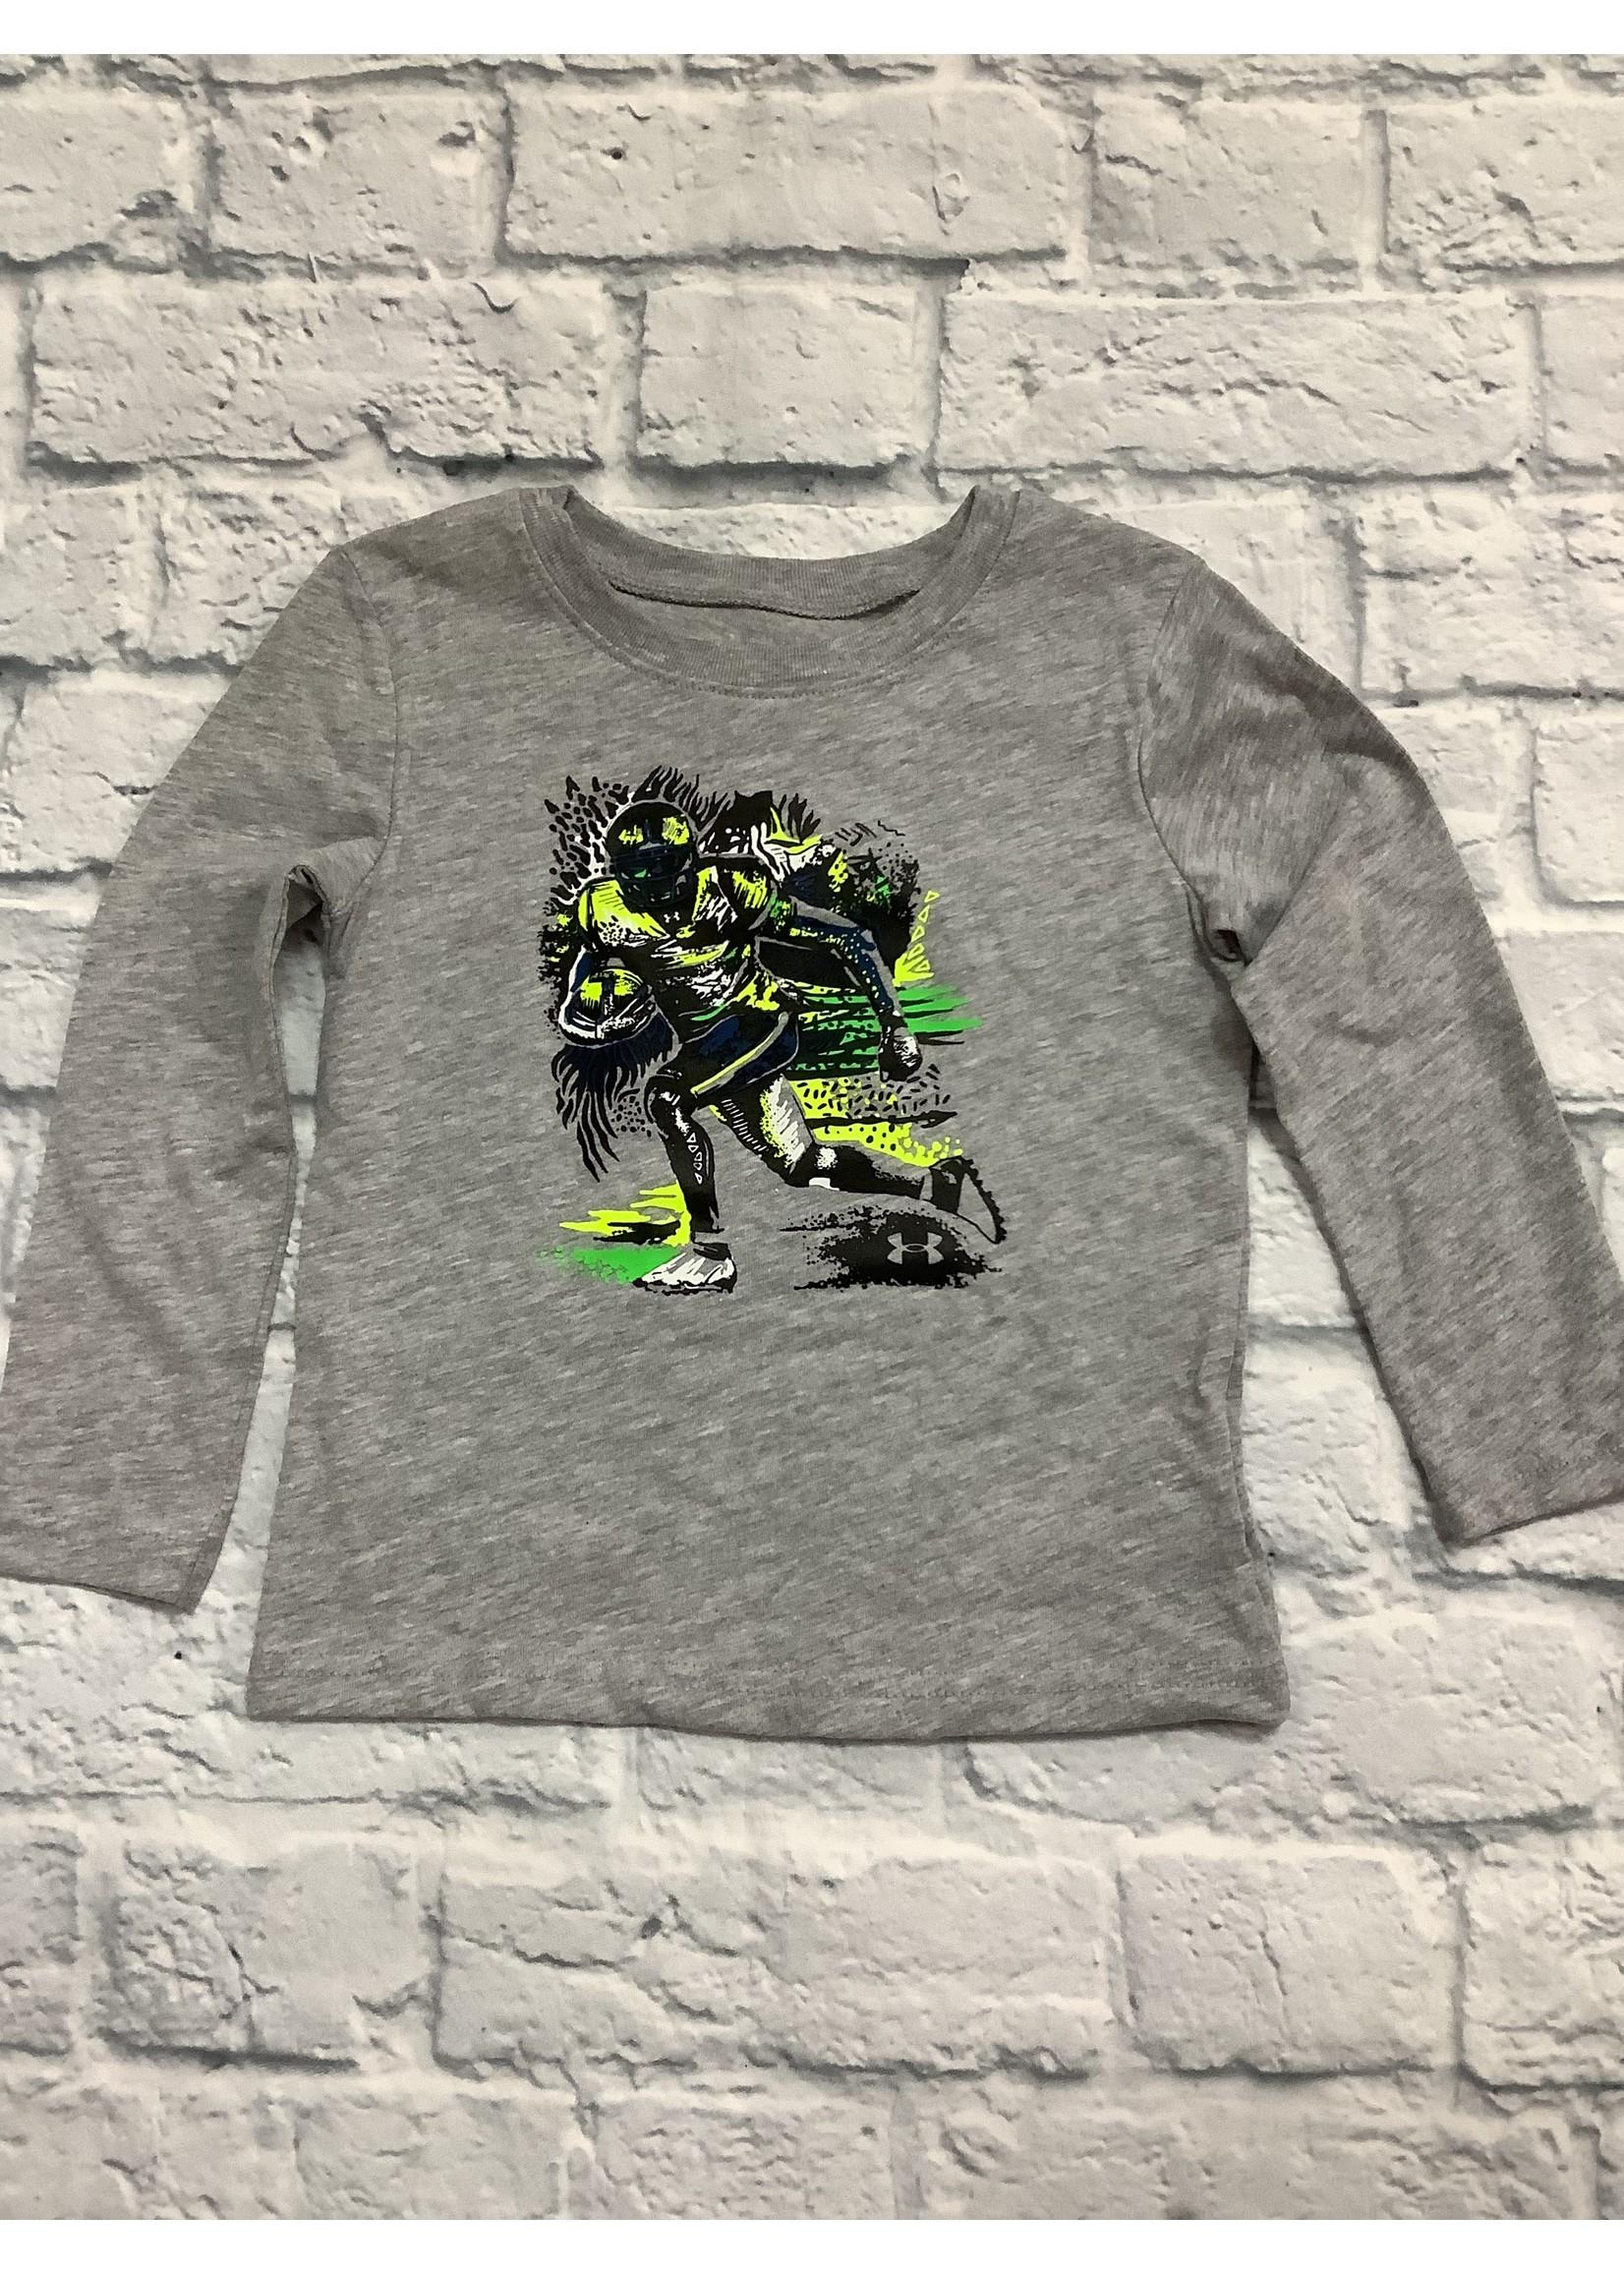 Under Armour Boys Player Sketch Long Sleeve Shirt